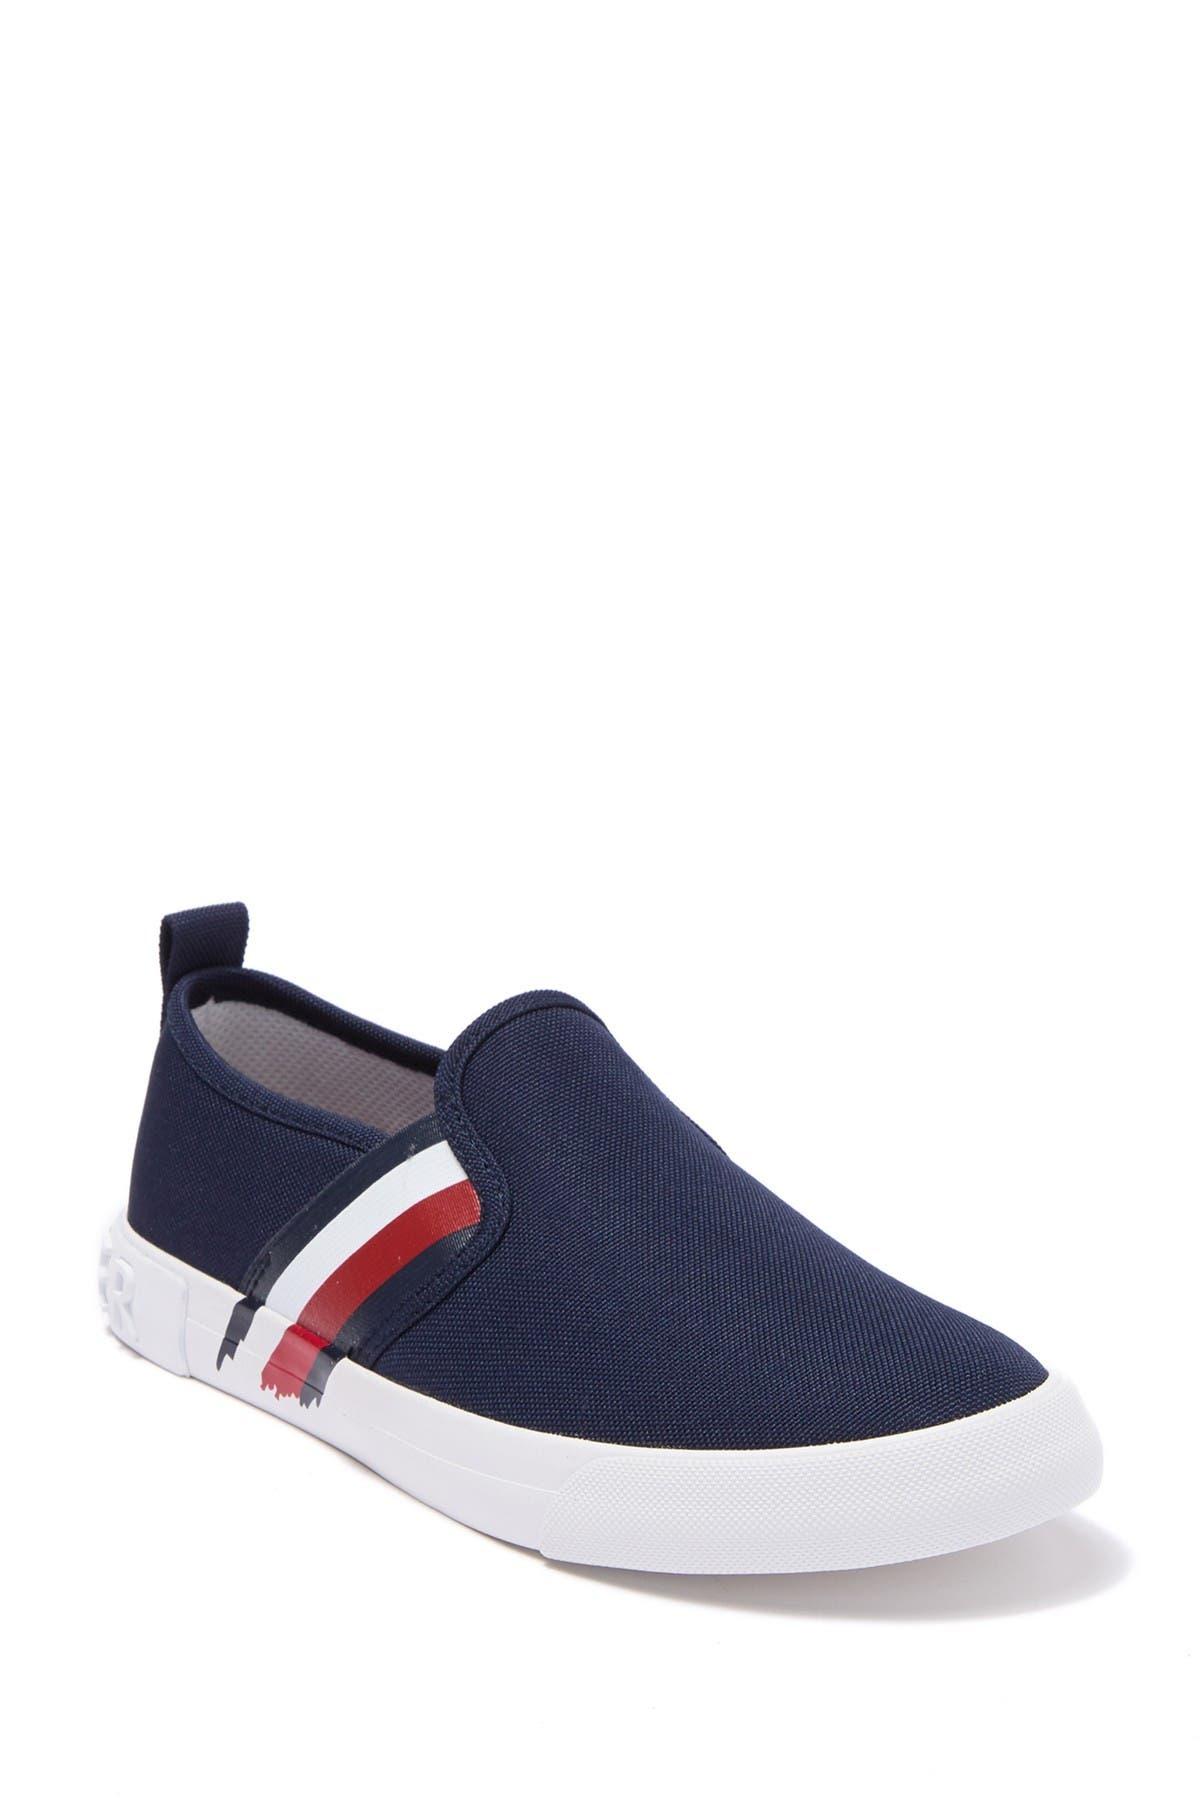 Image of Tommy Hilfiger Junna Painted Stripe Slip-On Sneaker